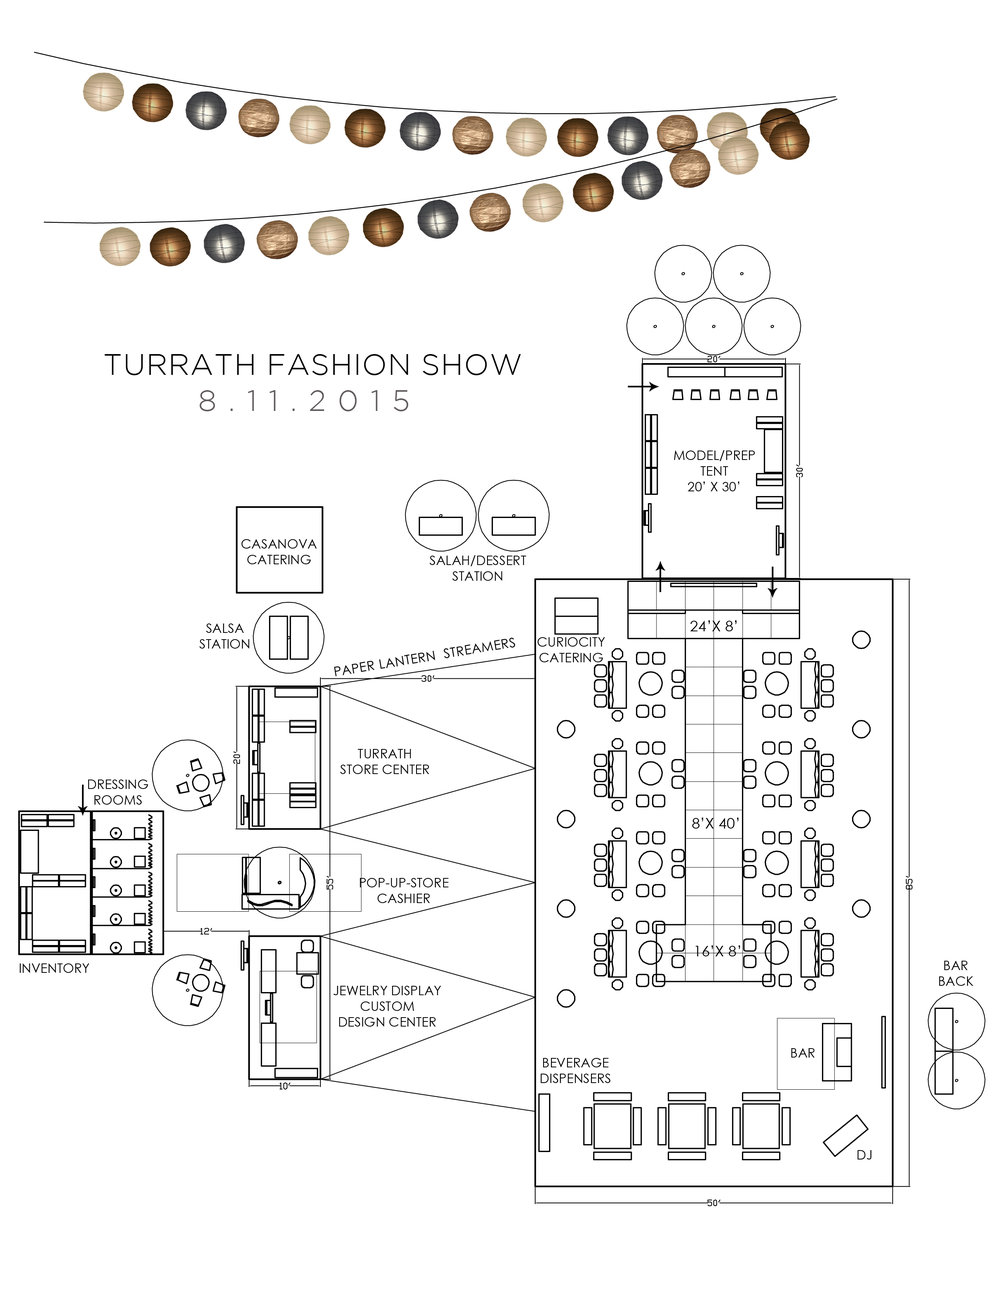 TURRATH Fashion Show - Layout.jpg